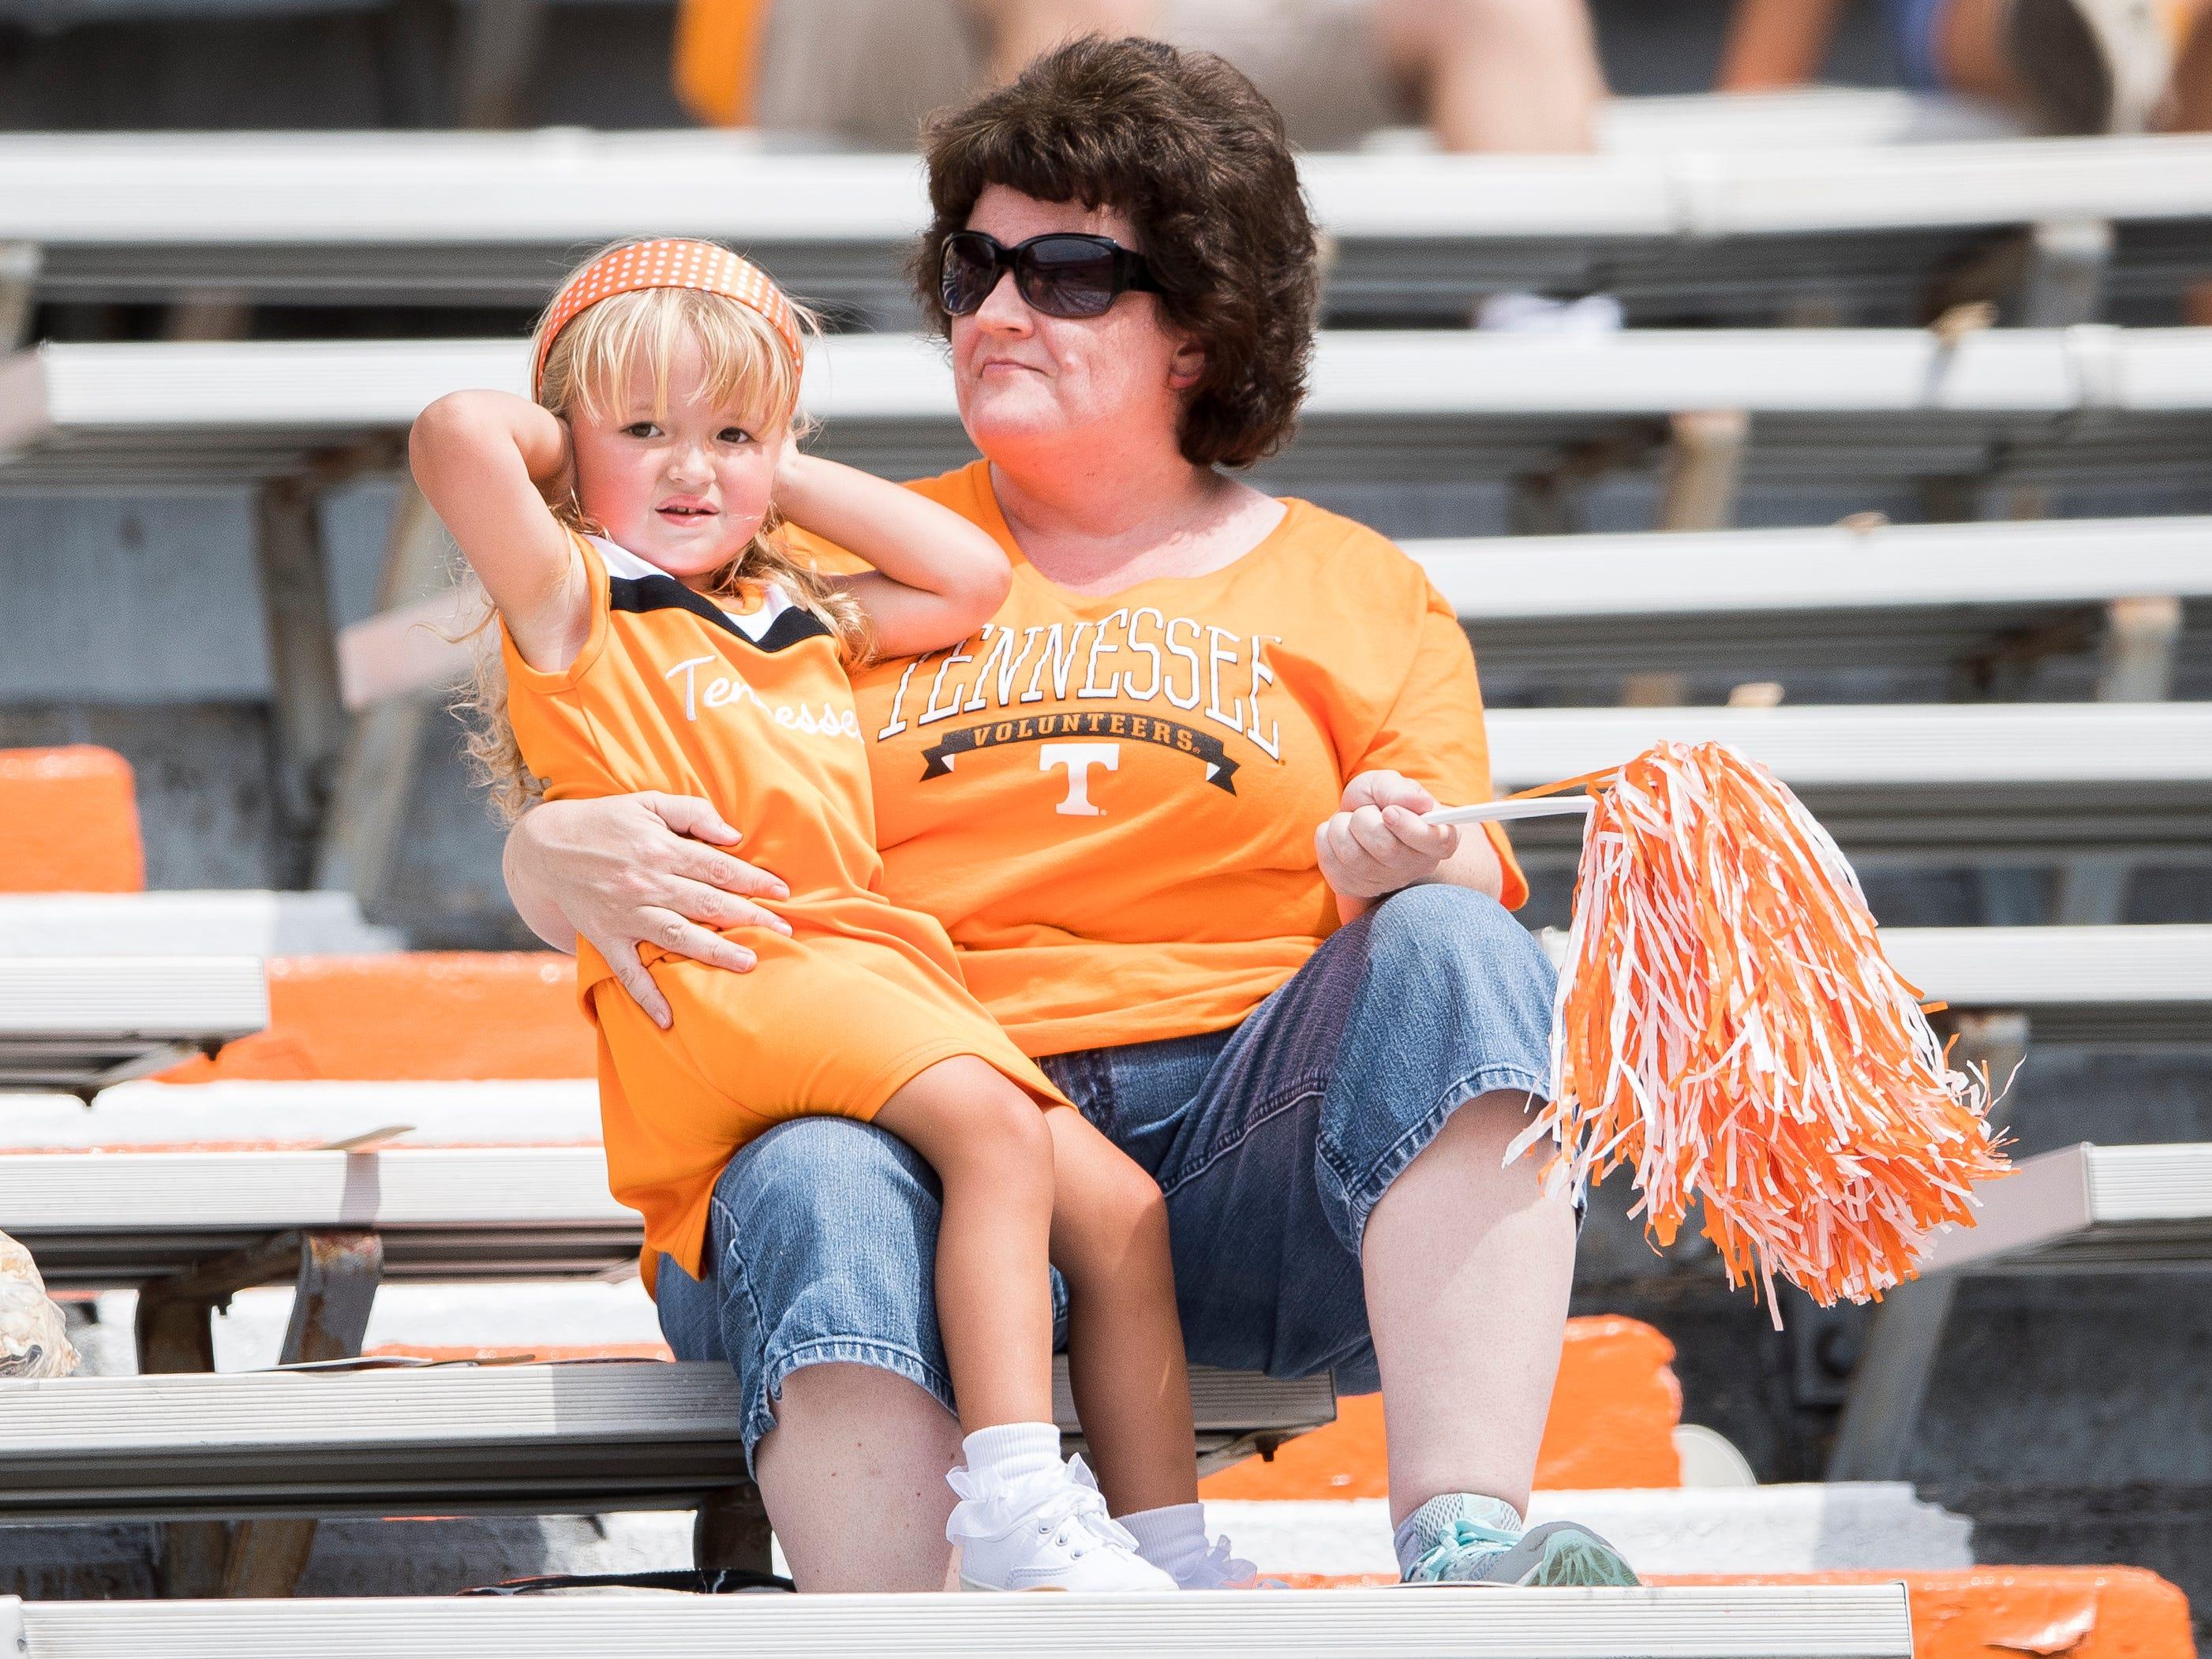 UT Vols fans before the Tennessee Volunteers' game against ETSU in Neyland Stadium on Saturday, Sept. 8, 2018.